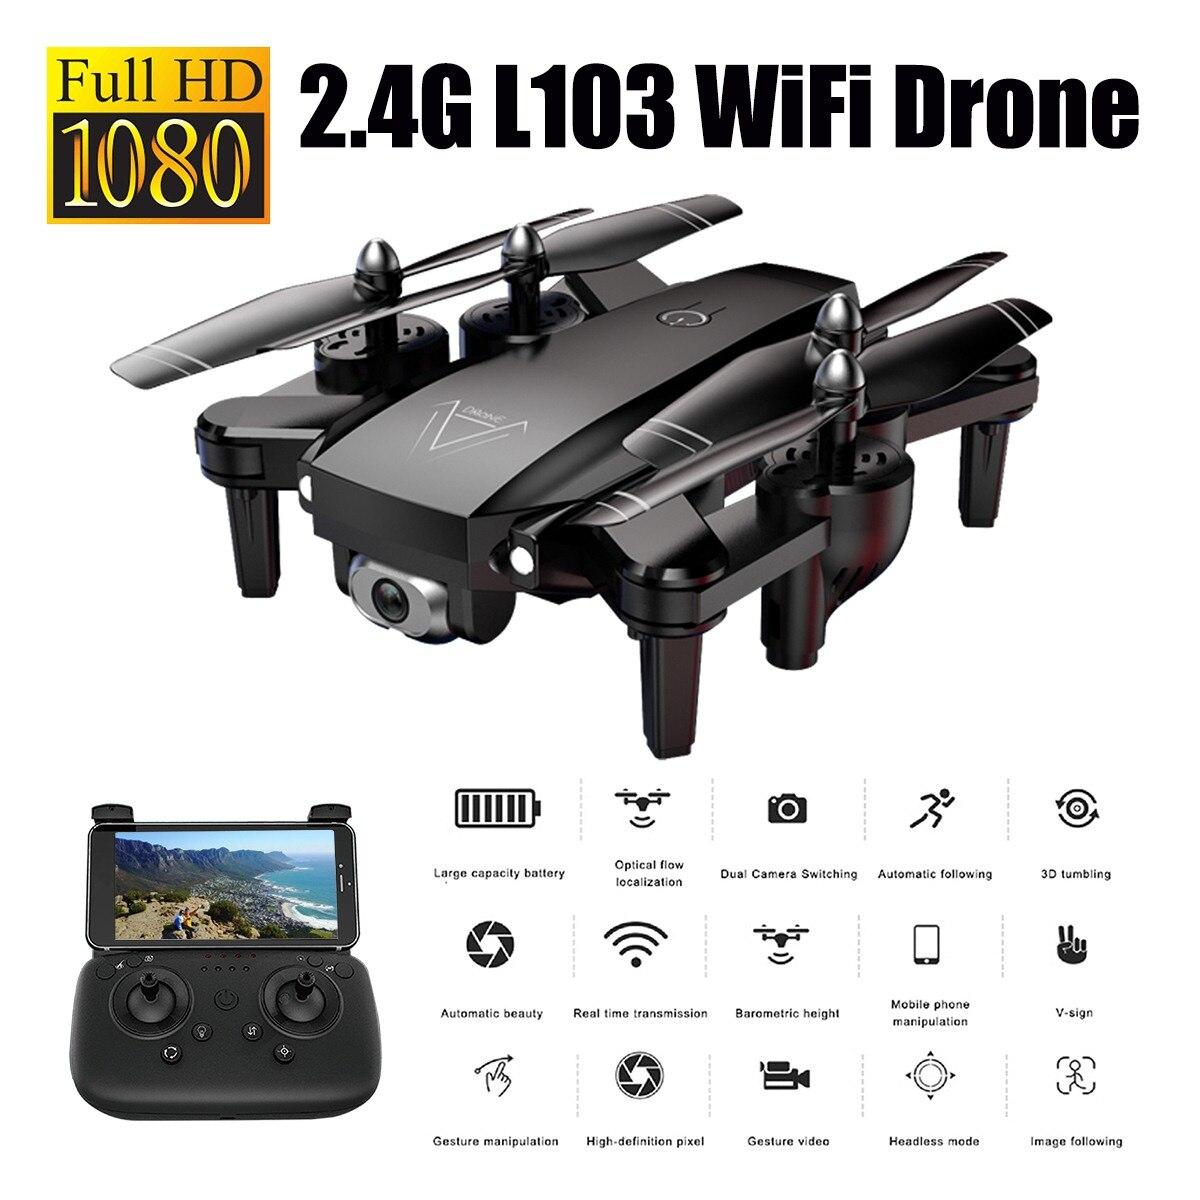 1080P RC Hubschrauber Kamera Drone Wifi Drohne mit Kamera Rc Hubschrauber mit Kamera 2,4G Optischen Fluss Position Drone kamera